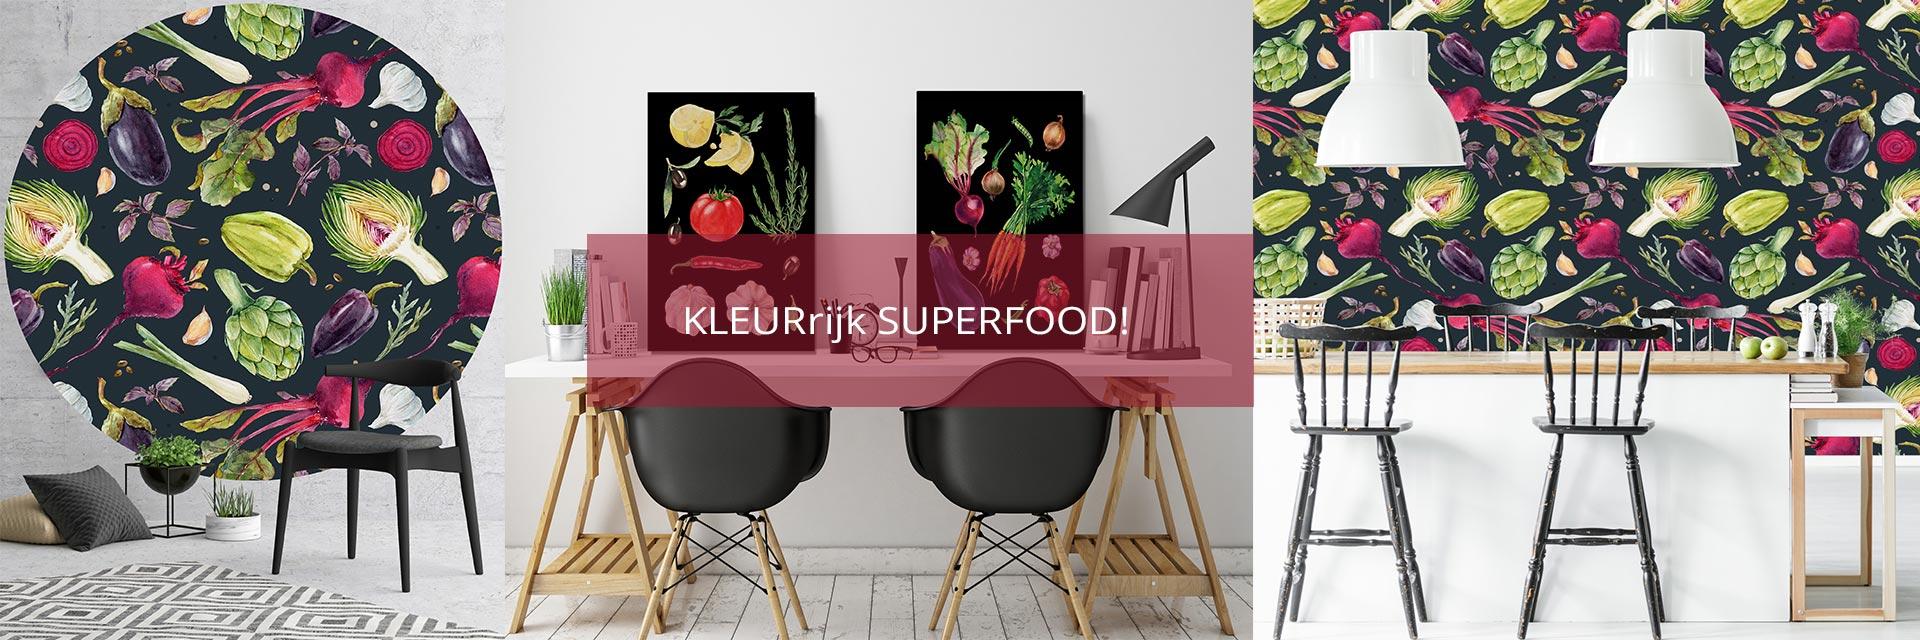 WANDenWOONdeco.nl sfeer SUPERFOOD